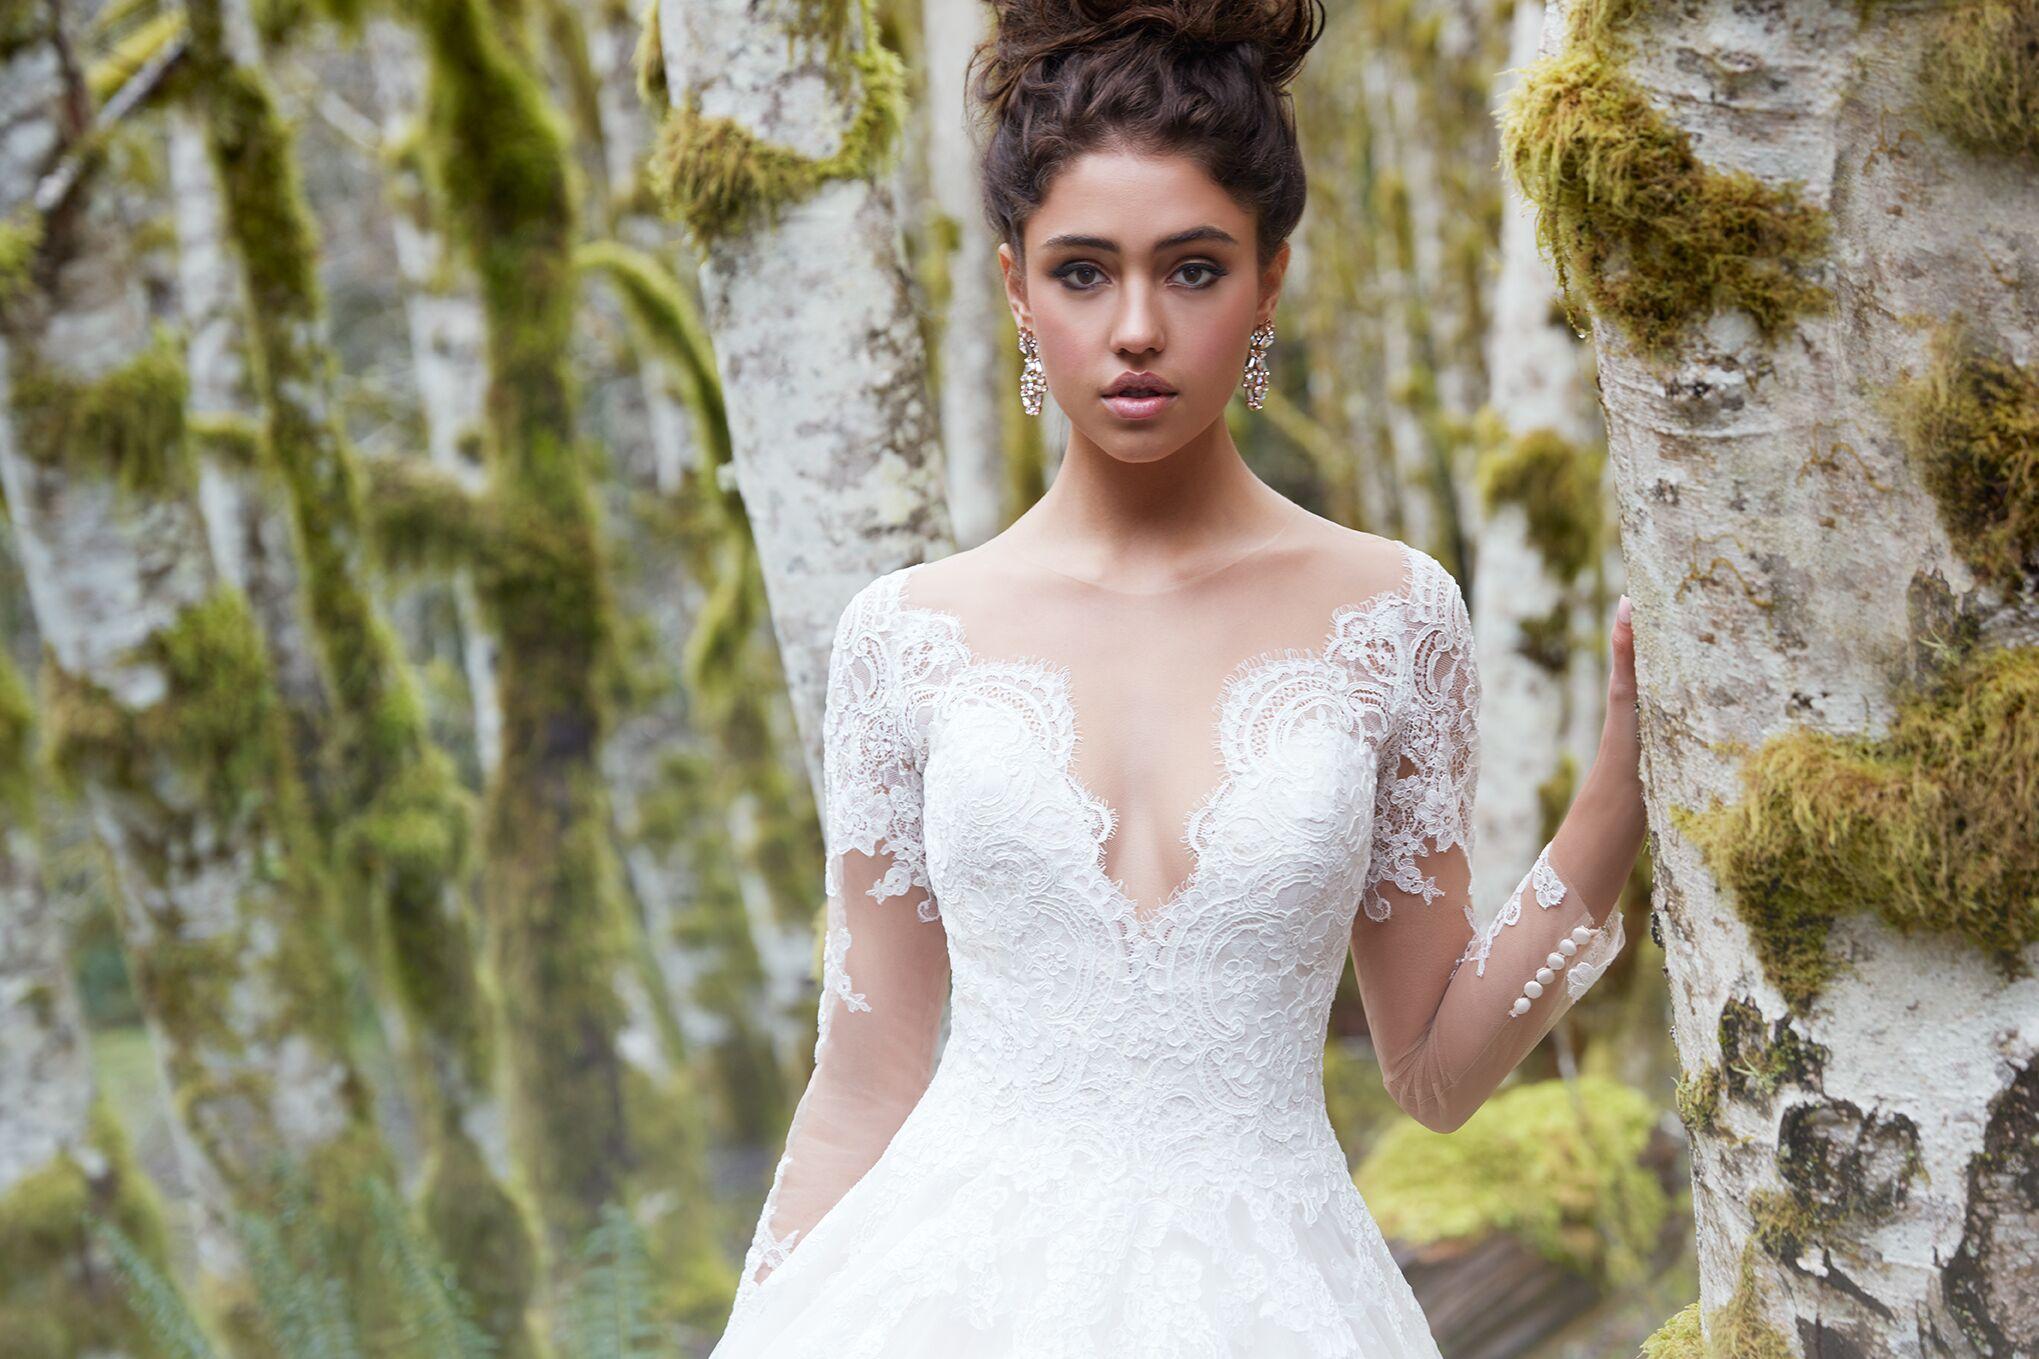 Simple Wedding Dresses 2017 Trends And Ideas: Bridal Salons - Wilmington, DE